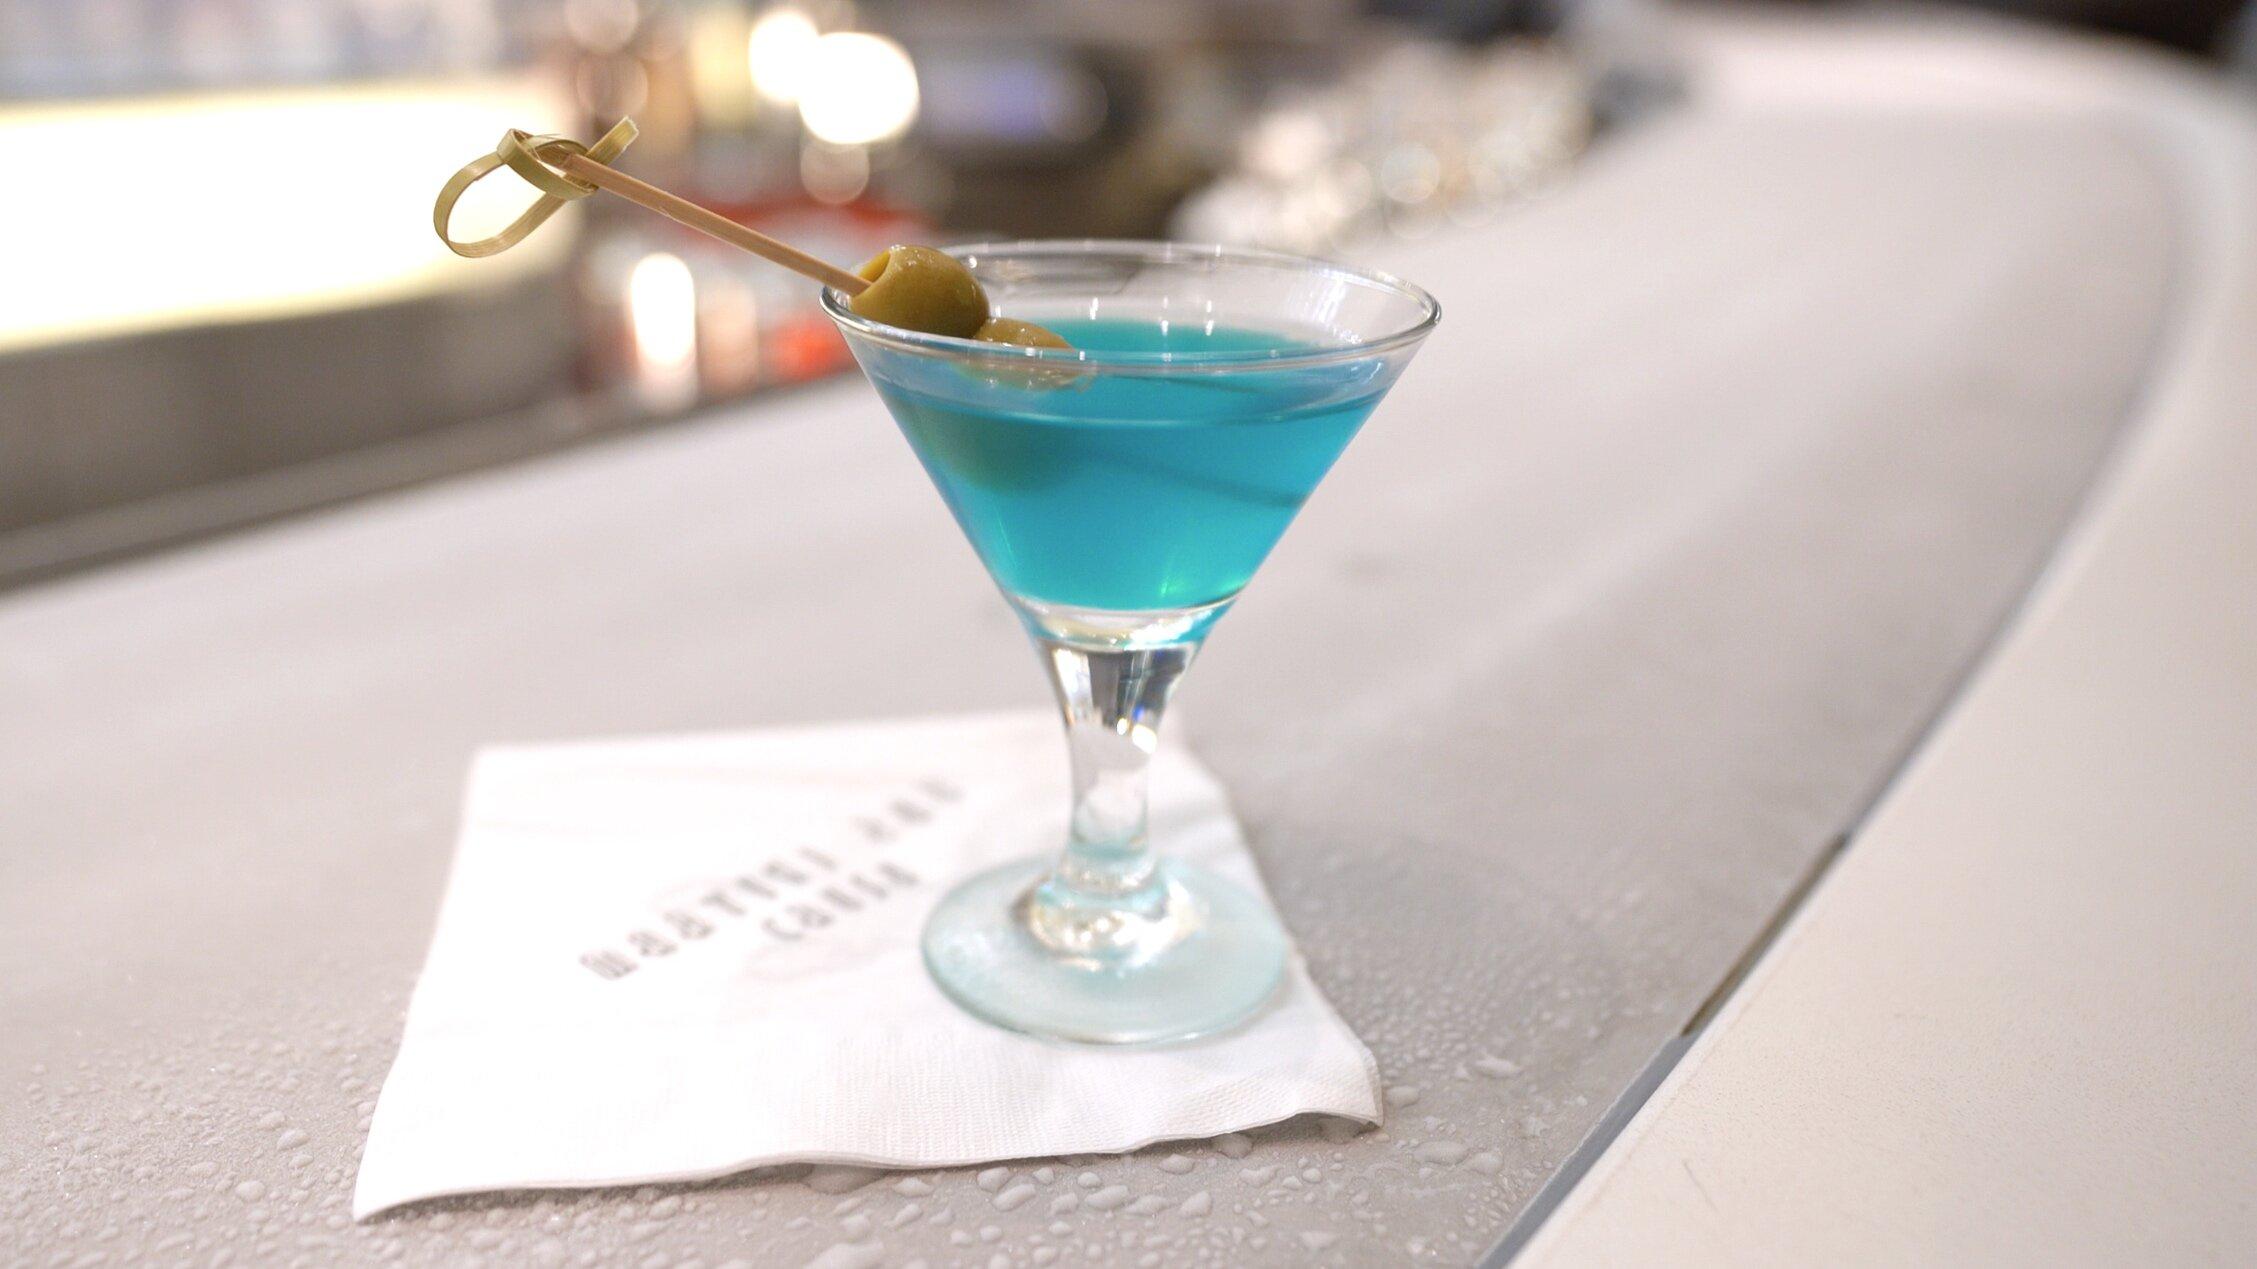 Martini on ice.